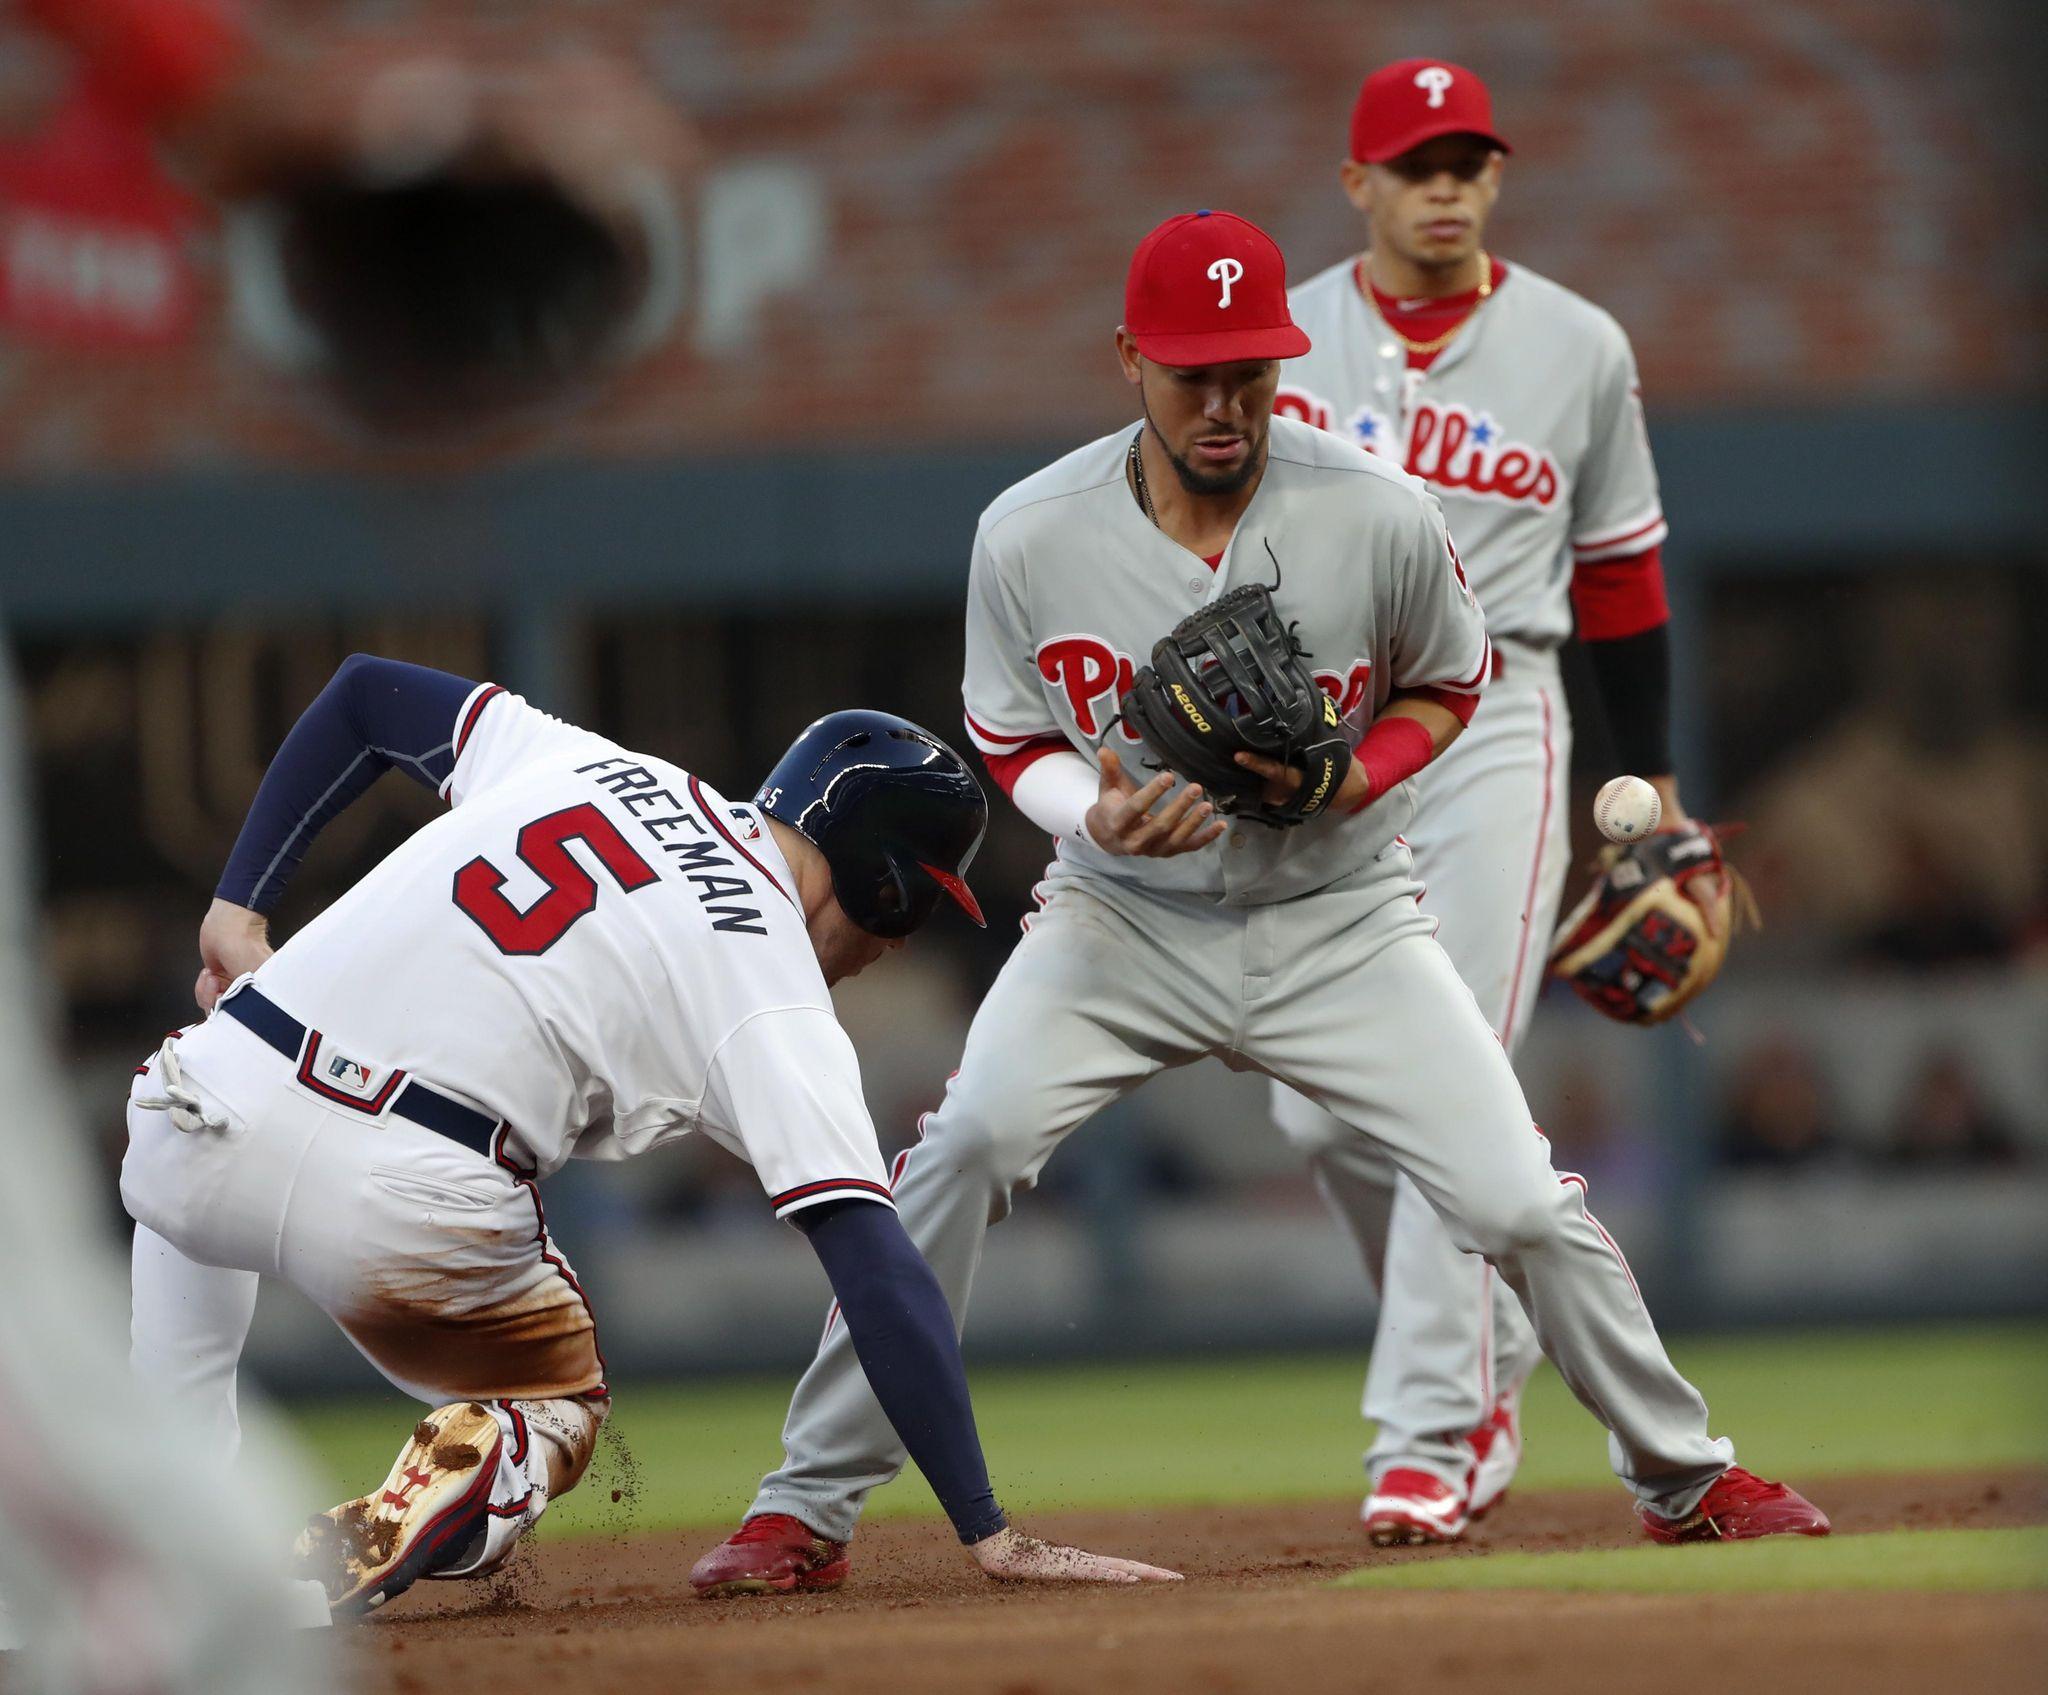 Phillies_braves_baseball_17325_s2048x1695